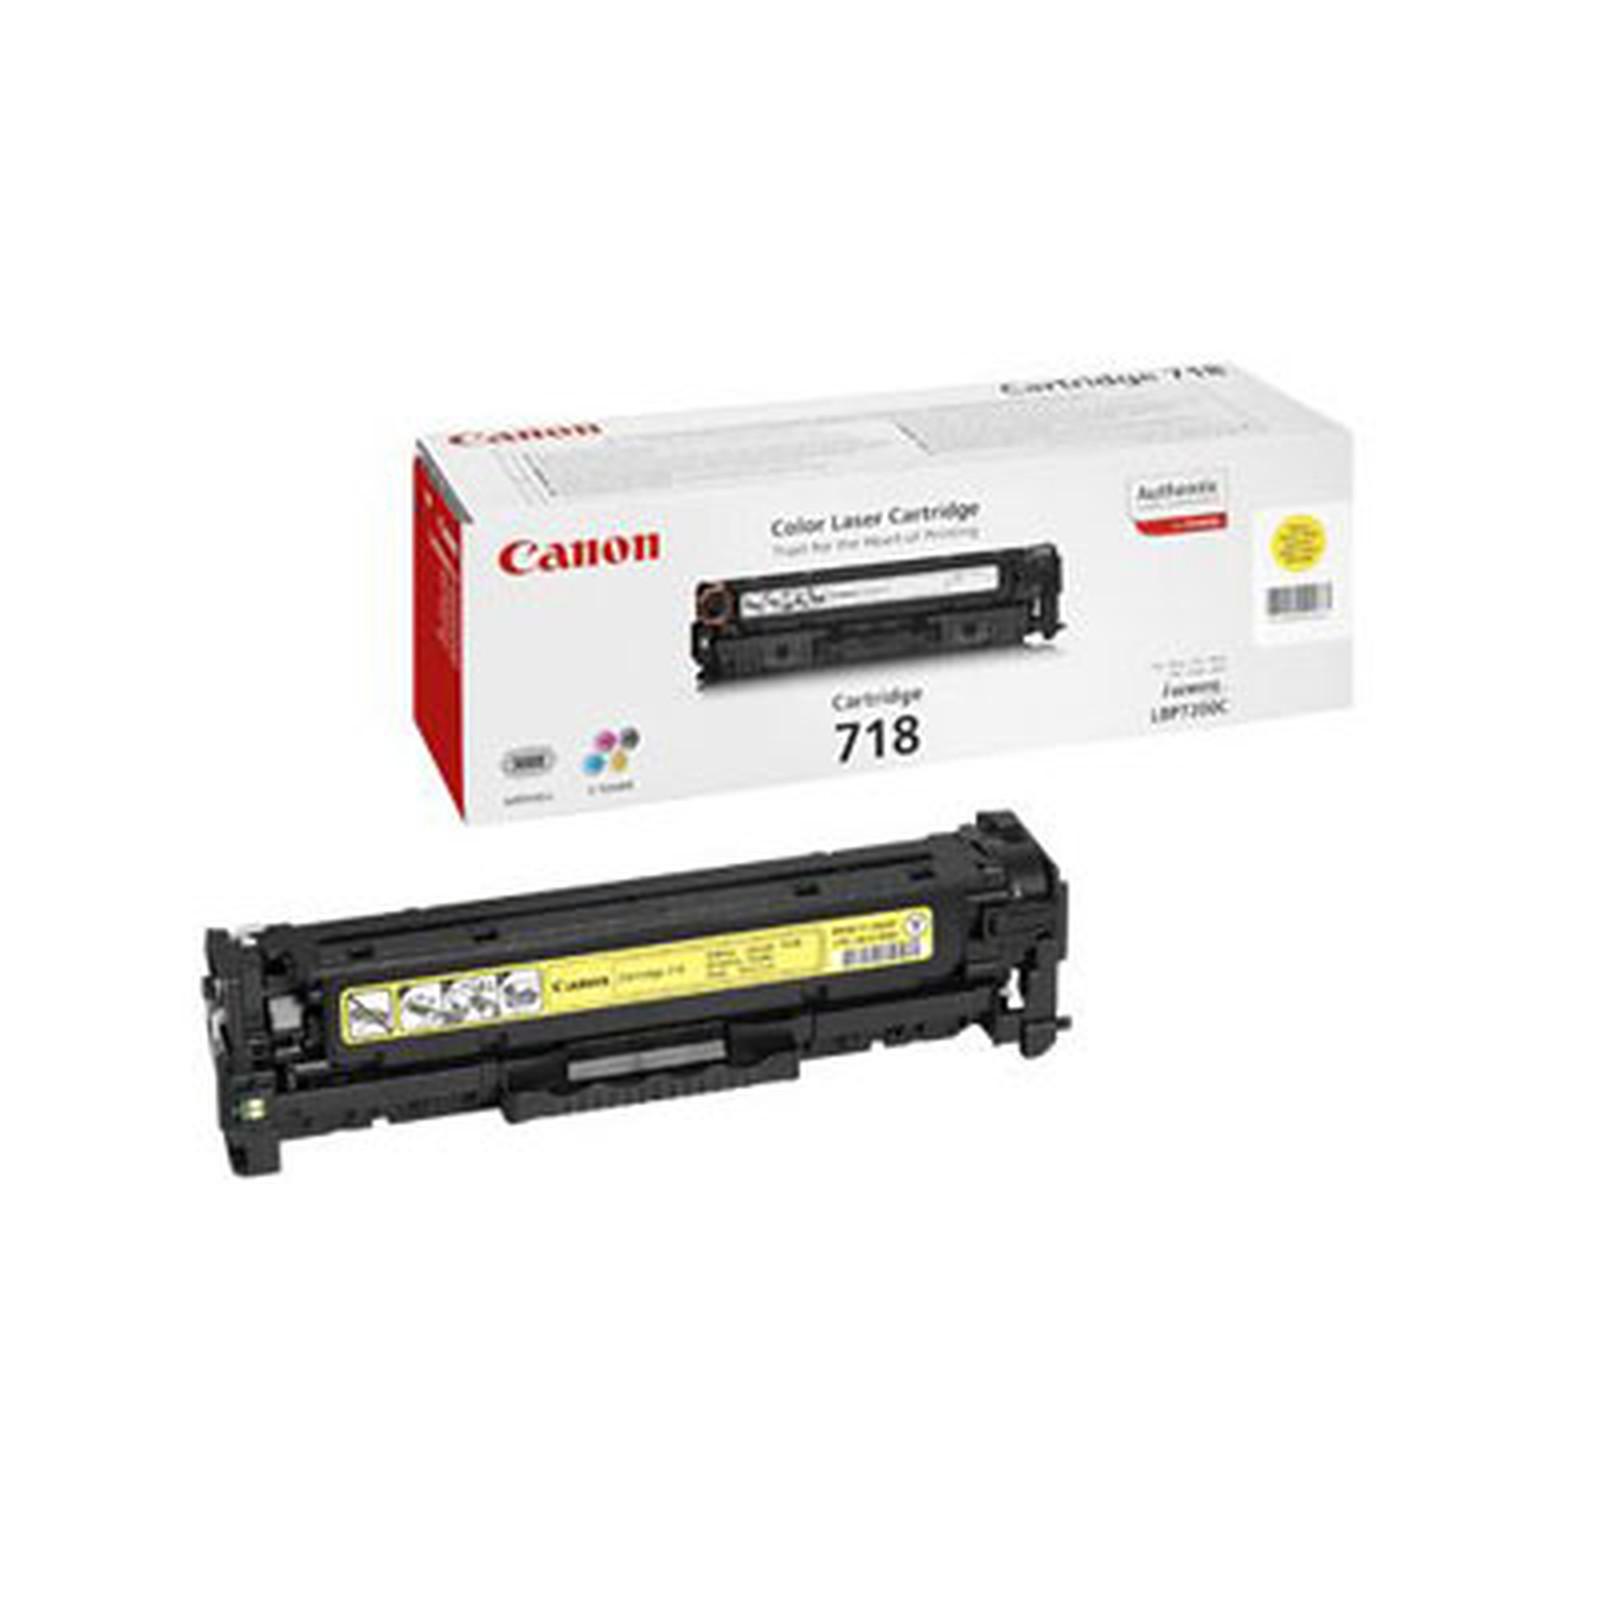 Canon 718 - Toner Jaune (pour i-SENSYS LBP7200Cdn)